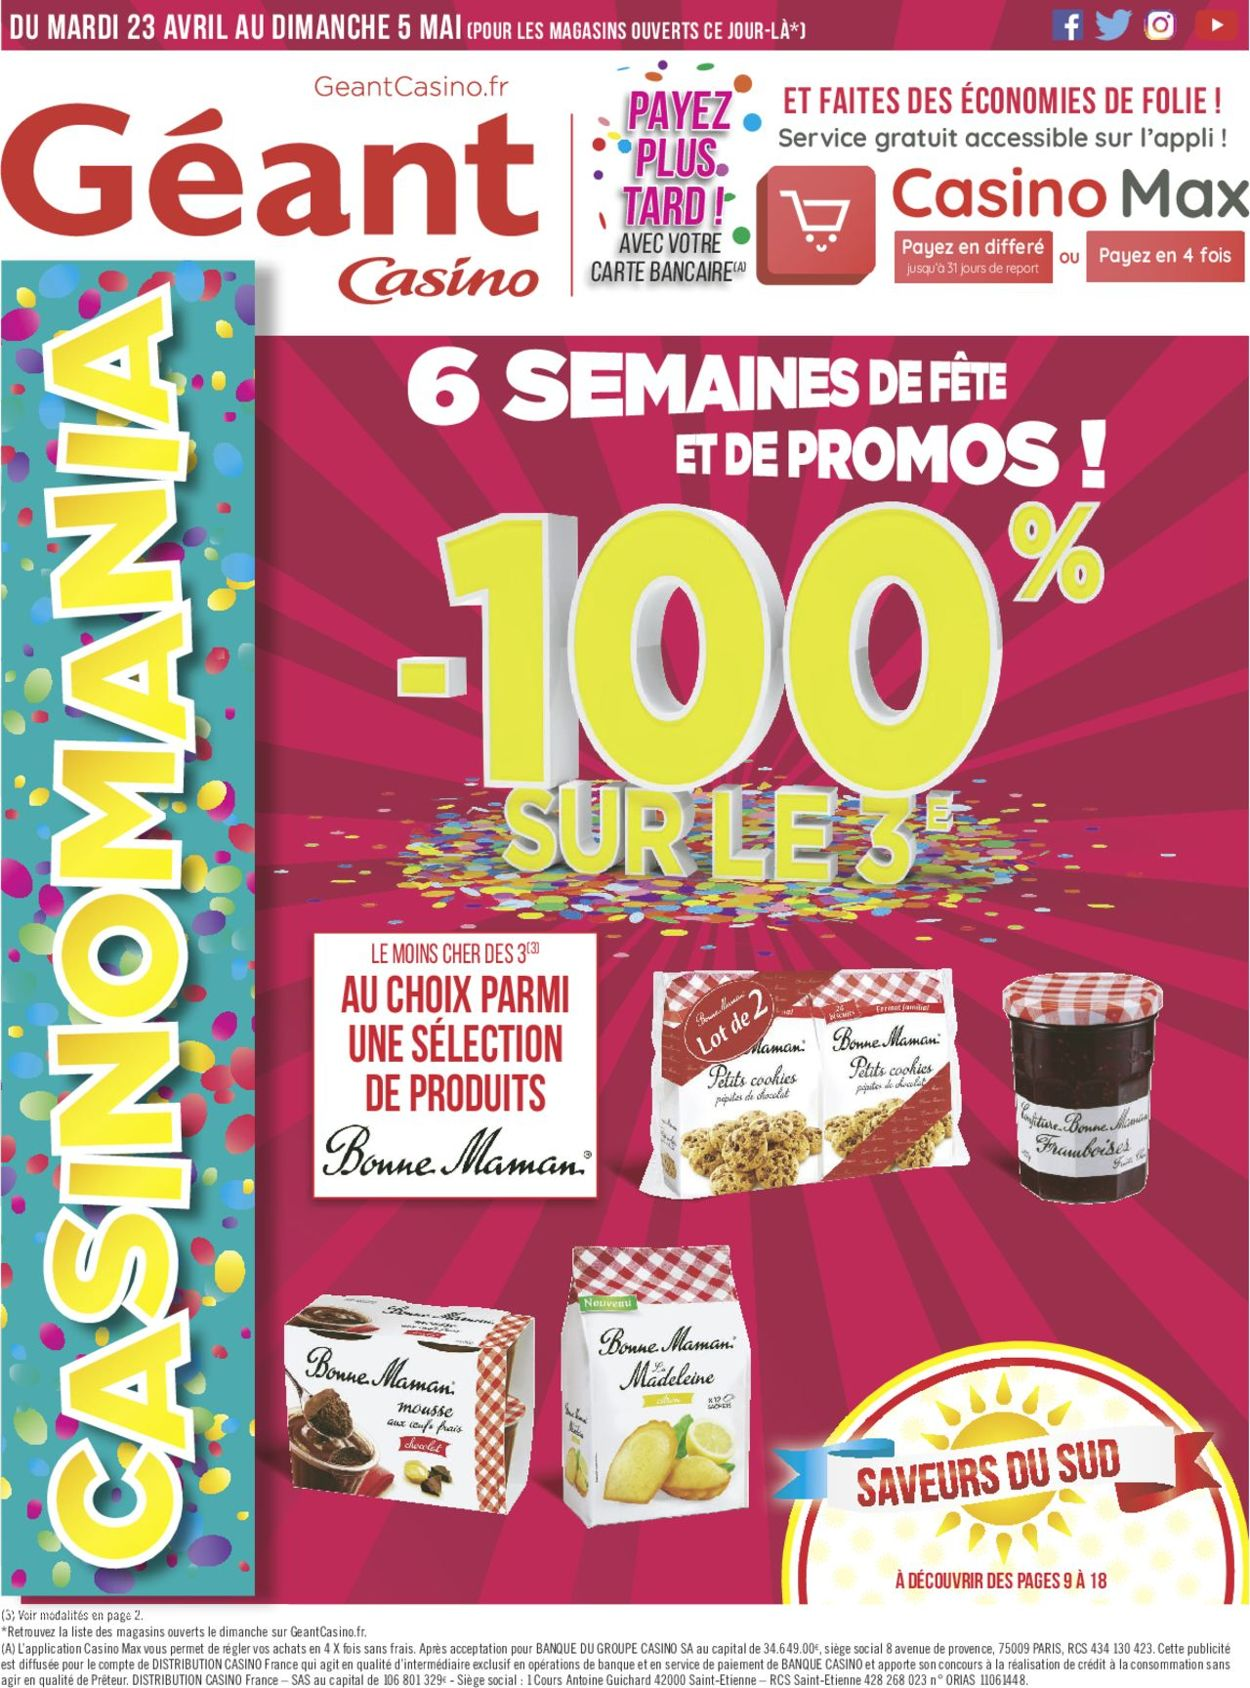 Géant Casino Catalogue - 23.04-05.05.2019